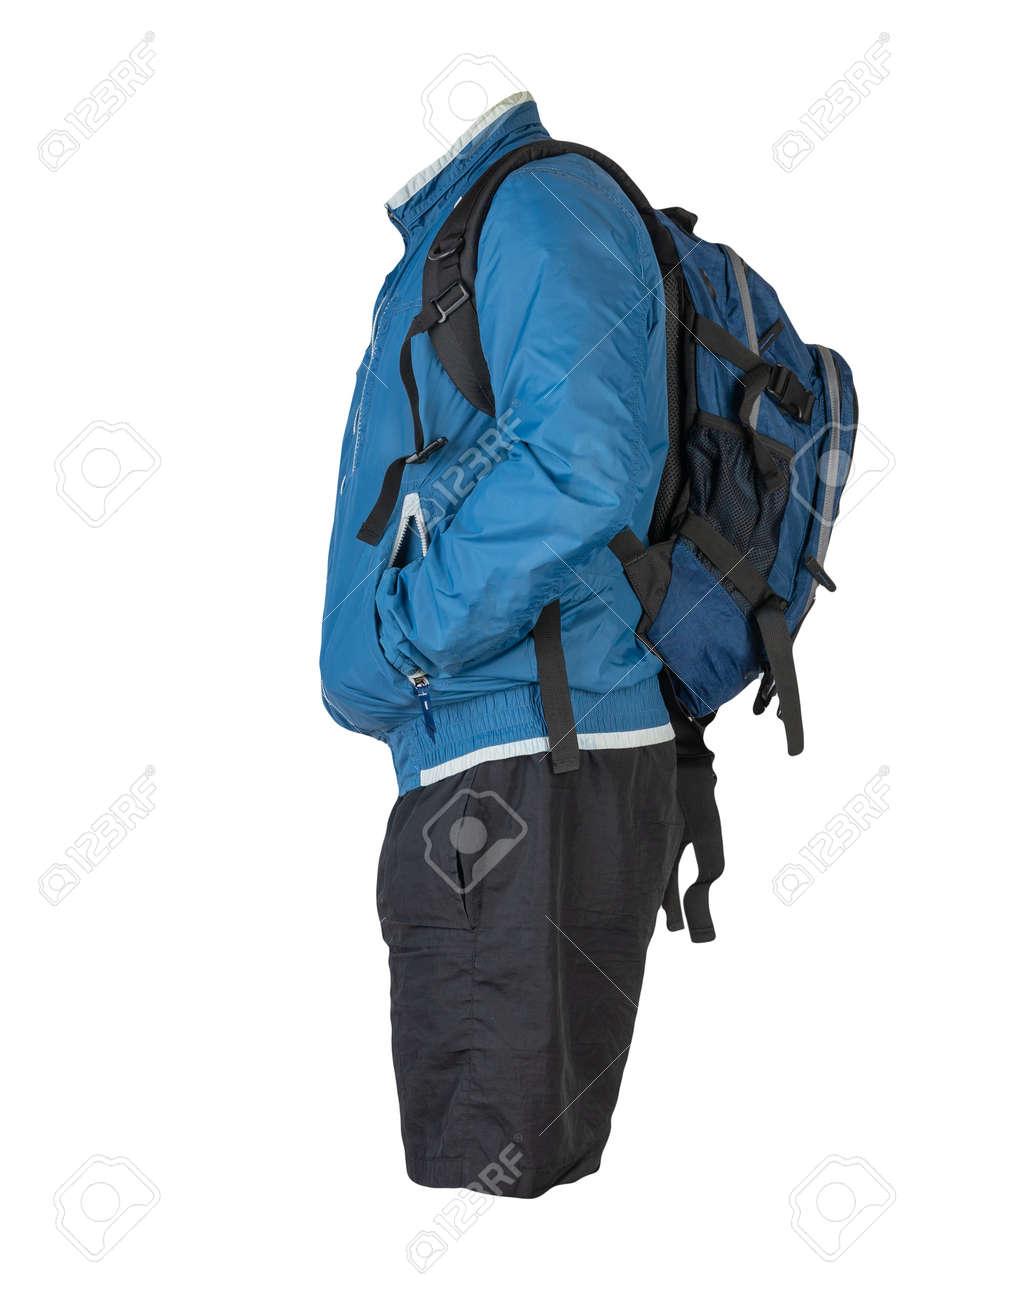 blue backpack, black shorts, blue summer windbreaker jacket isolated on white background. casual wear - 172073752